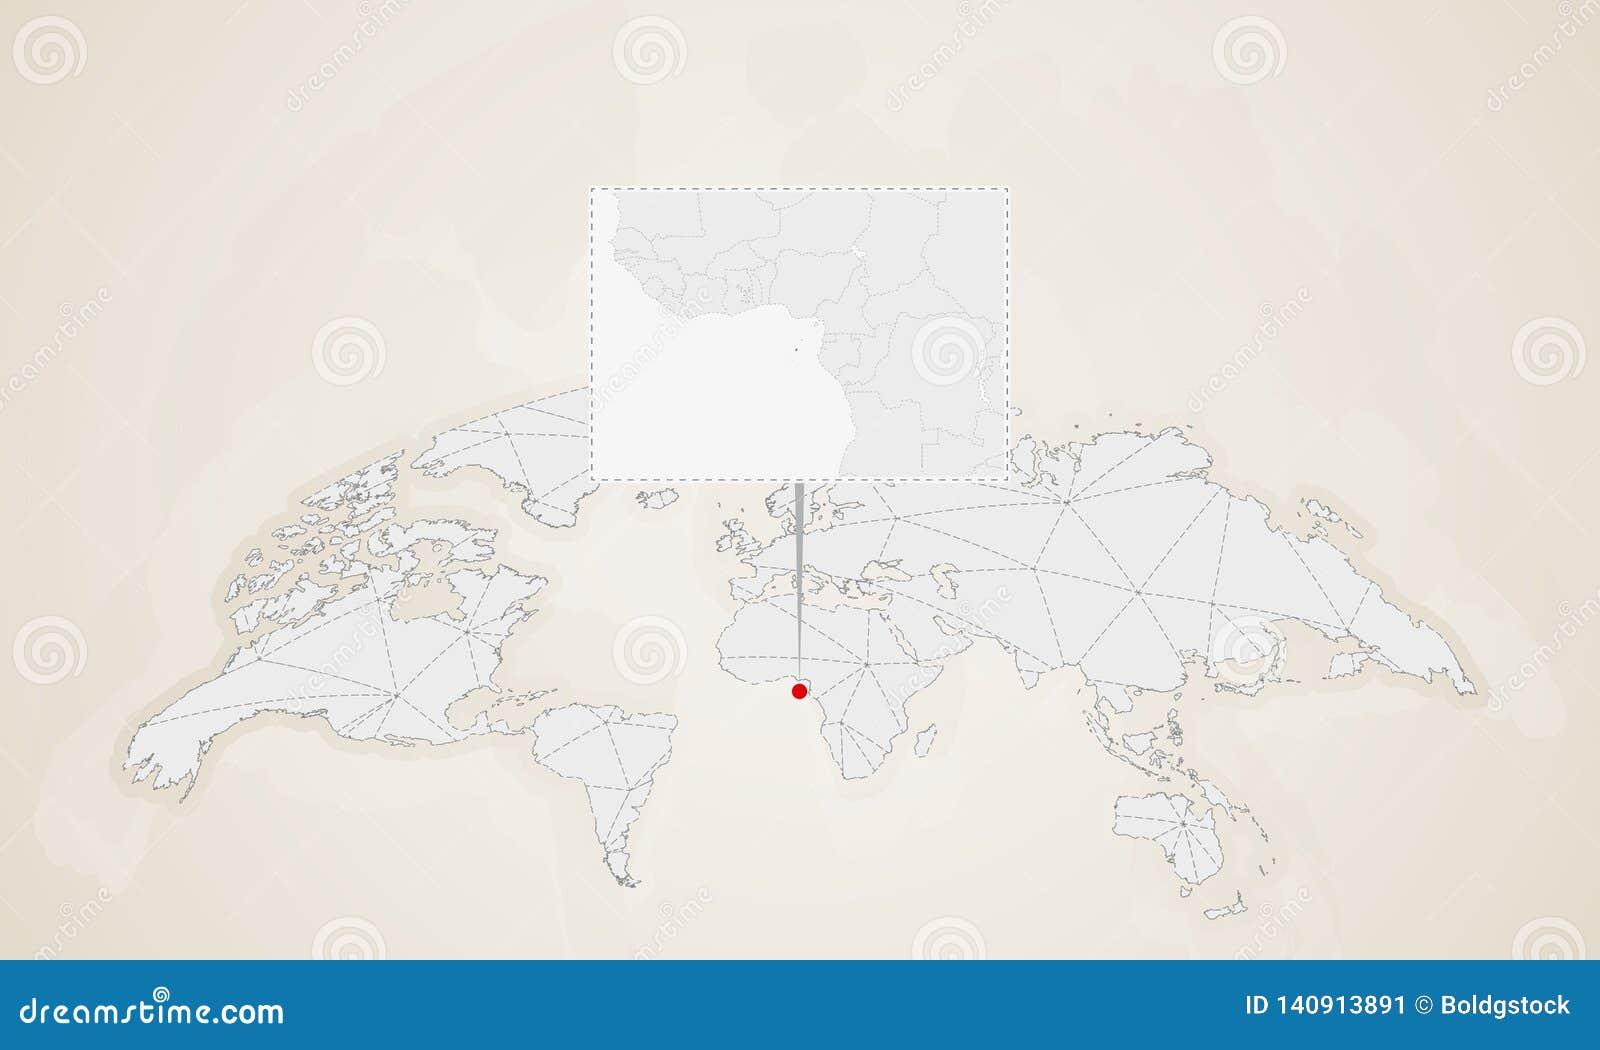 Map Of Sao Tome And Principe With Neighbor Countries Pinned ... Sao Tome World Map on saudi arabia world map, mauritania world map, laos world map, liberia world map, japan world map, botswana world map, portugal world map, angola world map, switzerland world map, congo world map, norway world map, guantanamo bay world map, burundi world map, peru world map, bangladesh world map, denmark world map, tonga world map, brazil world map, france world map, n korea world map,